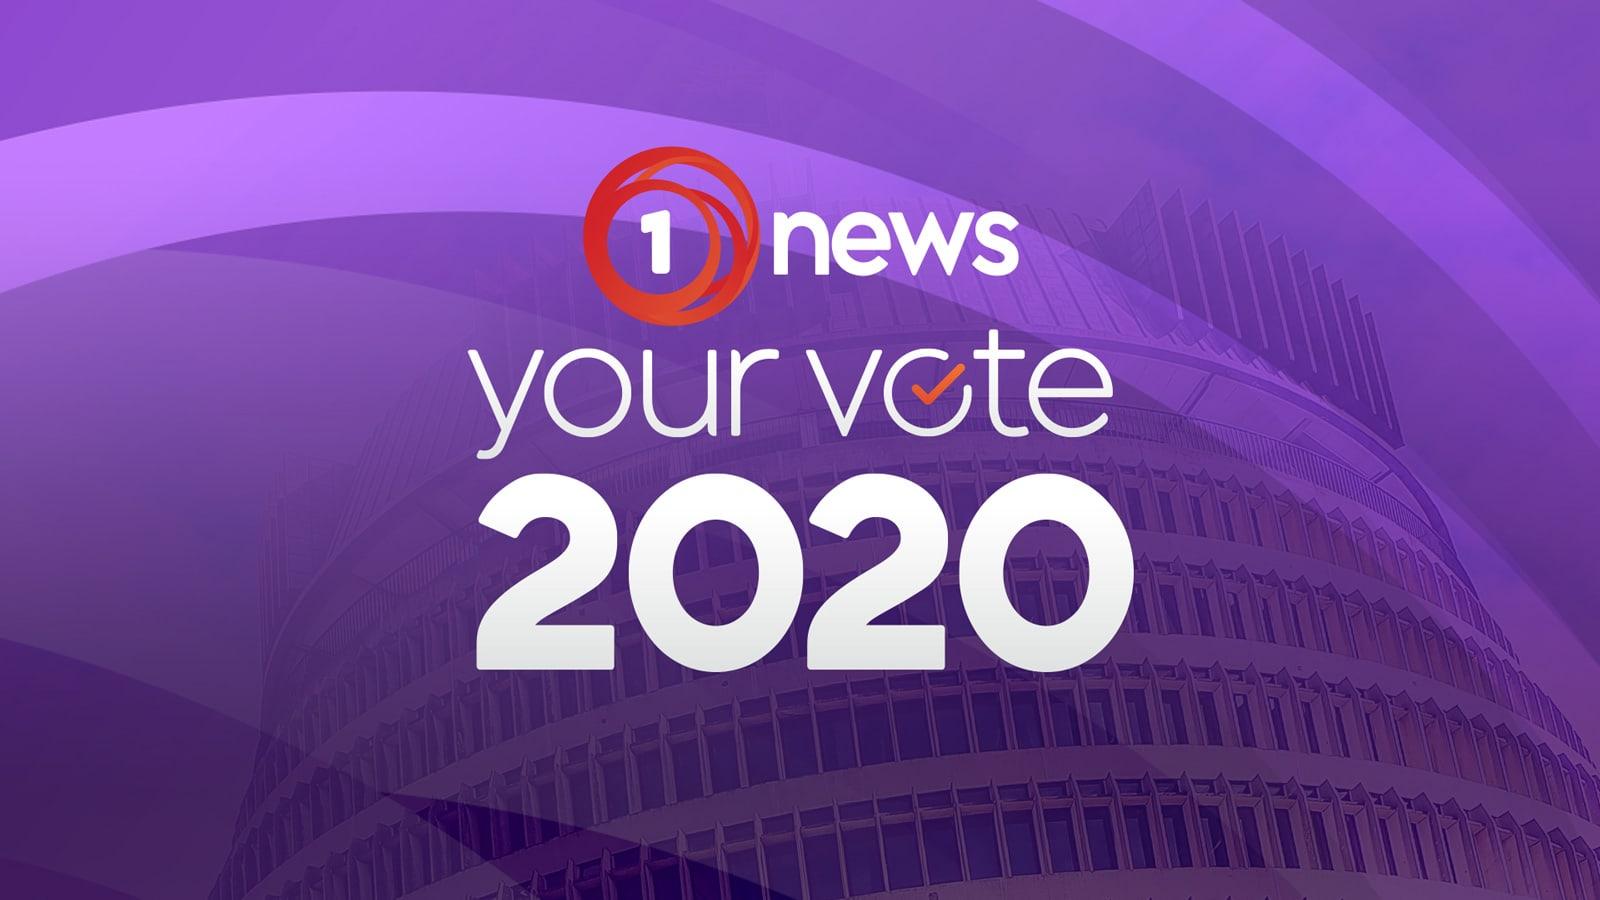 Girraphic Your Vote TVNZ BG